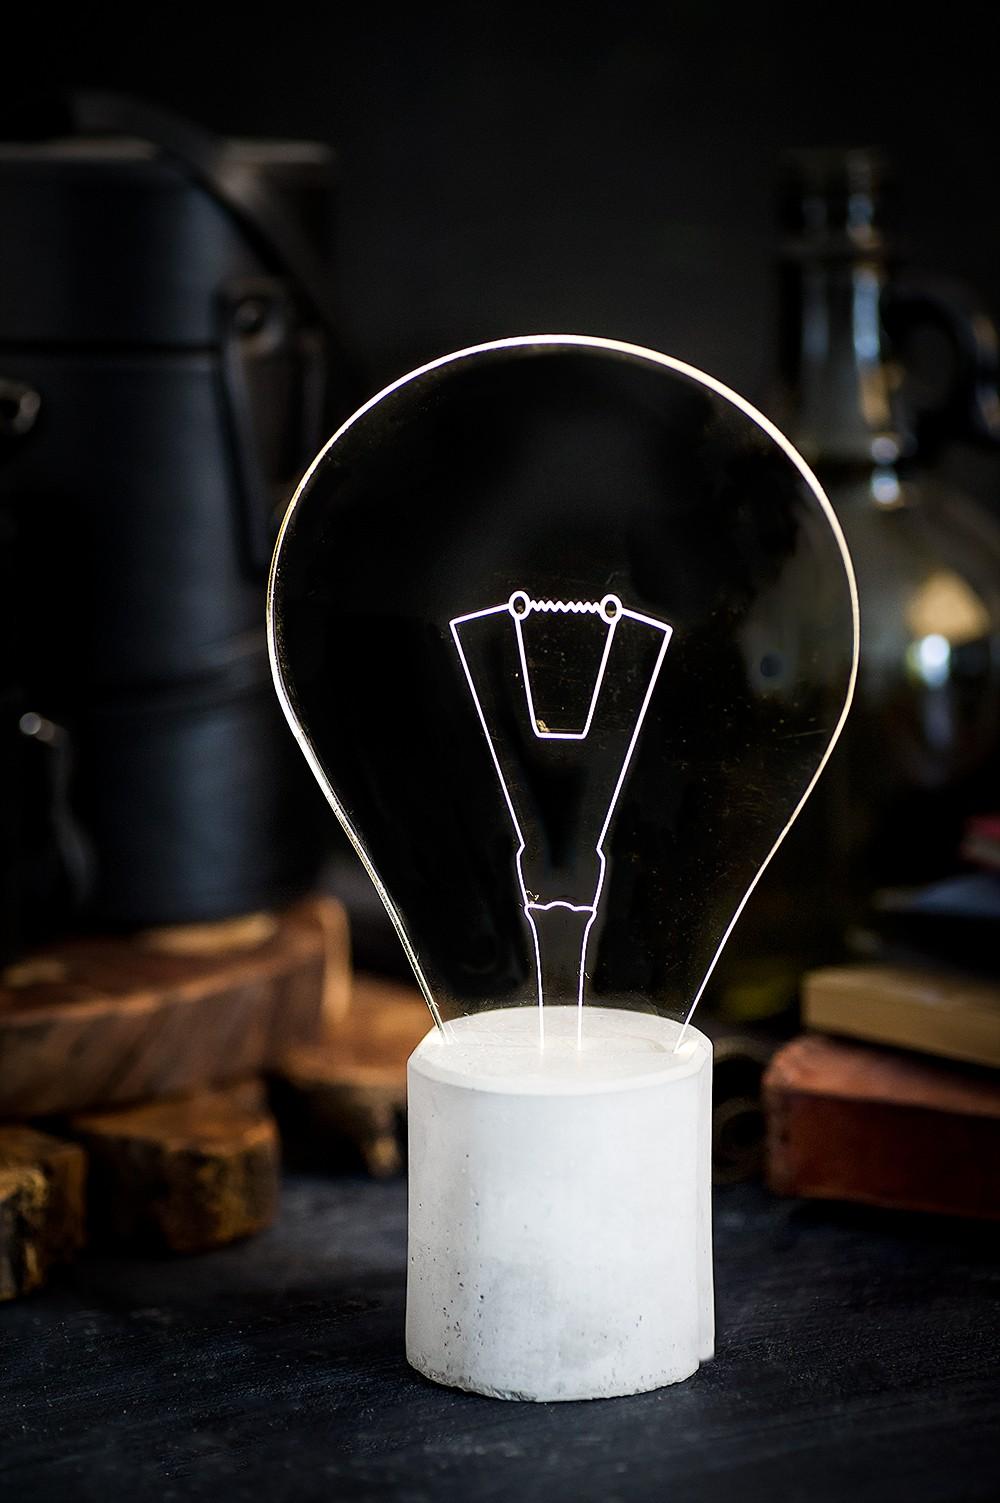 Lampe-Bulb-SturlesiDesign-03